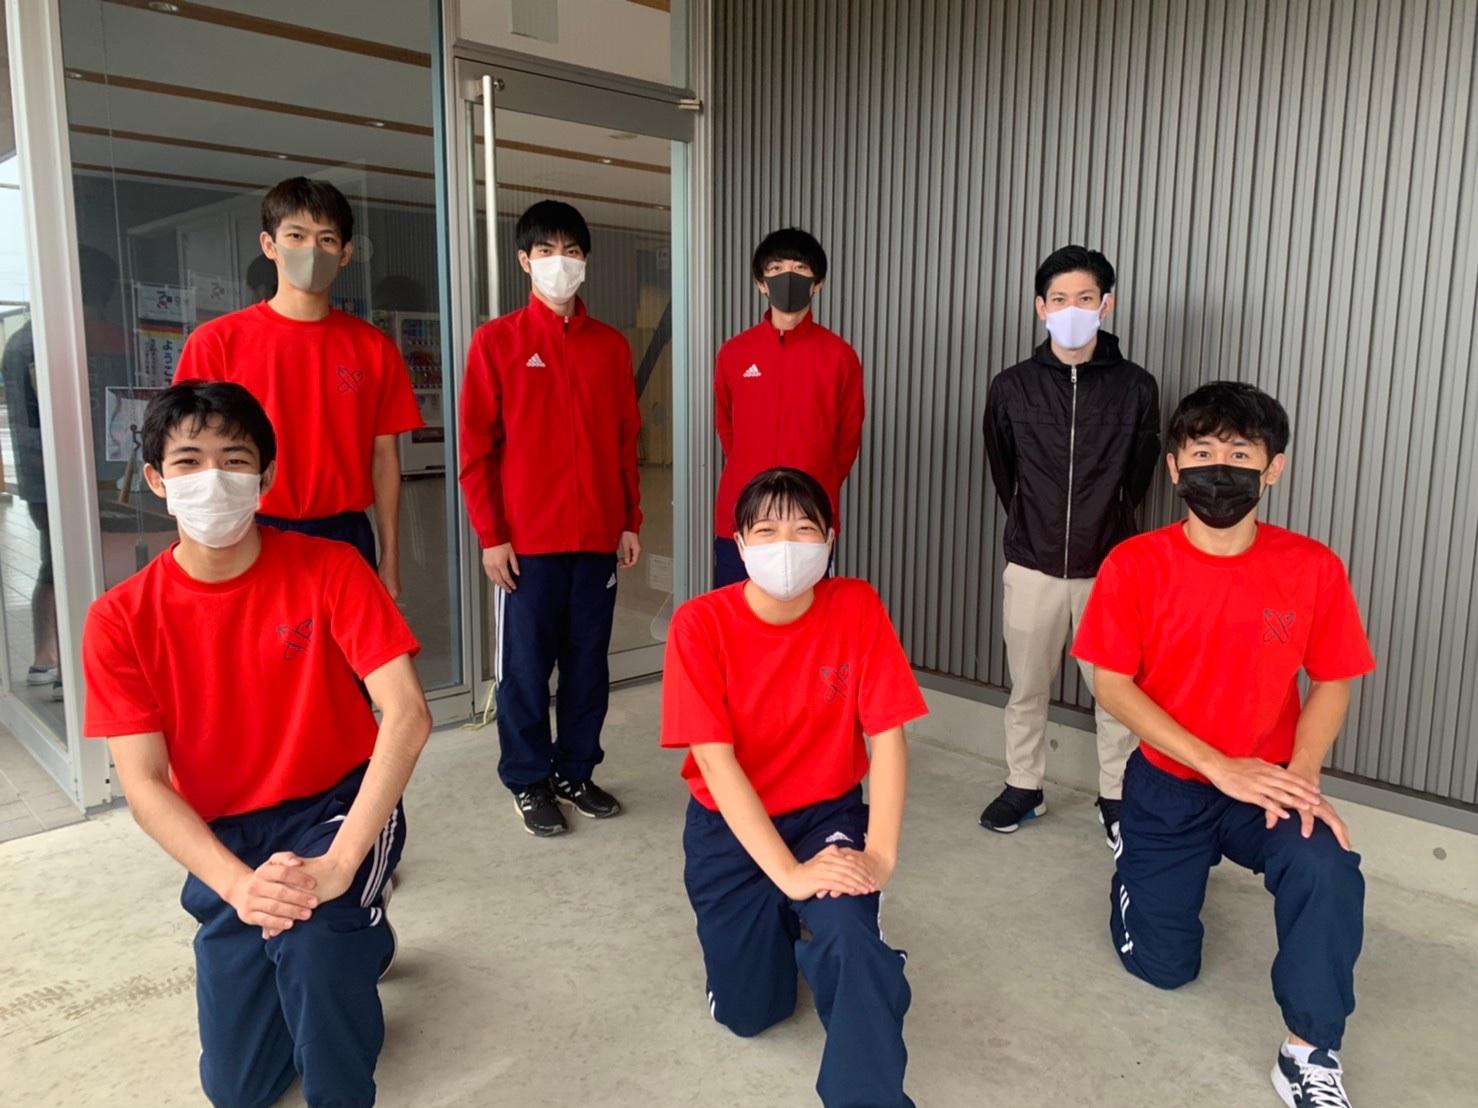 第57回全日本トランポリン競技選手権大会予選会 集合写真